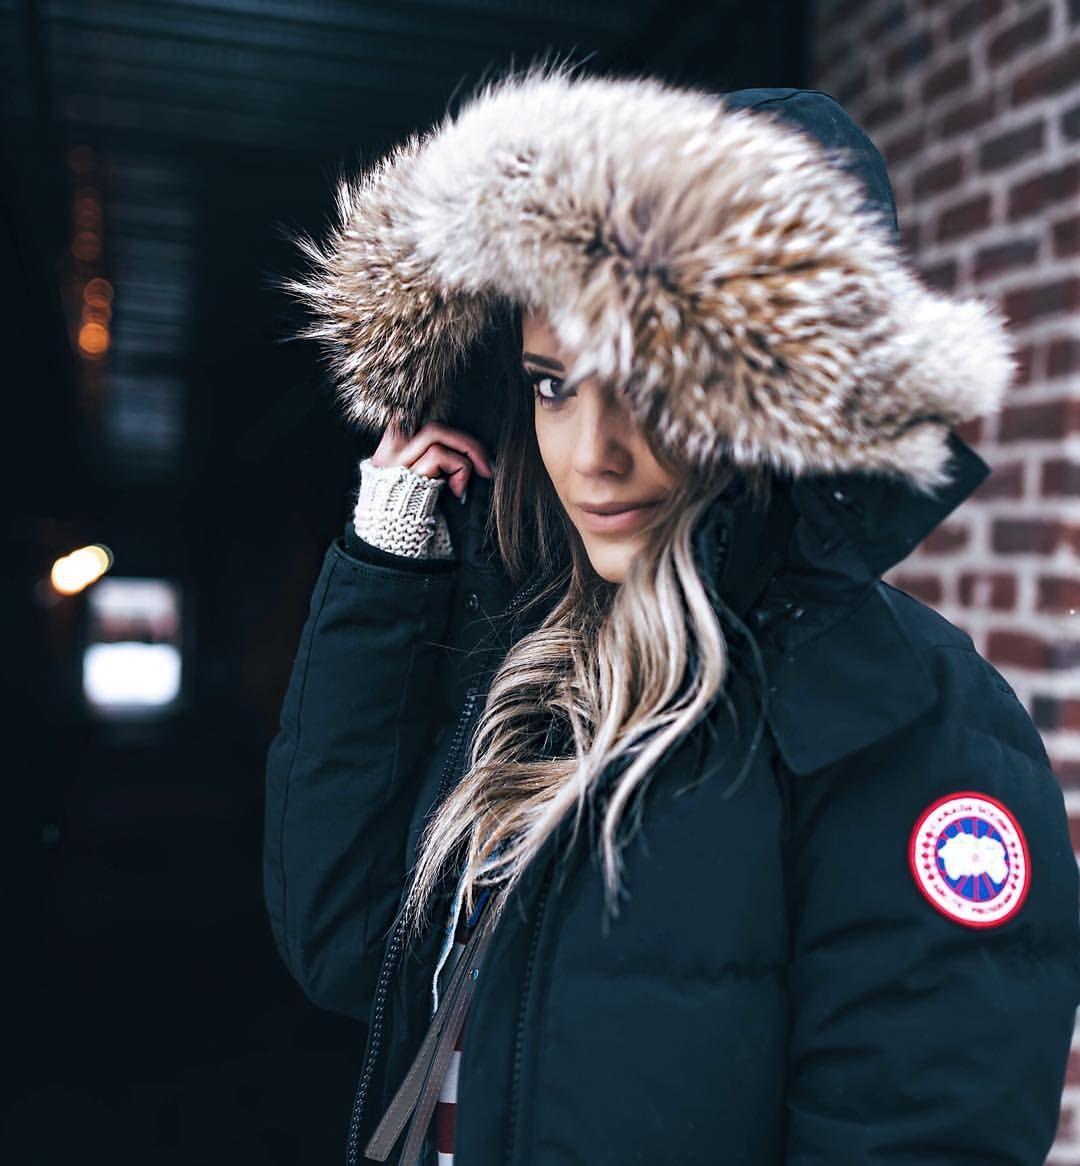 ef44d8a5a goose$99 on | Fashion | Winter fashion, Canada goose parka, Fashion